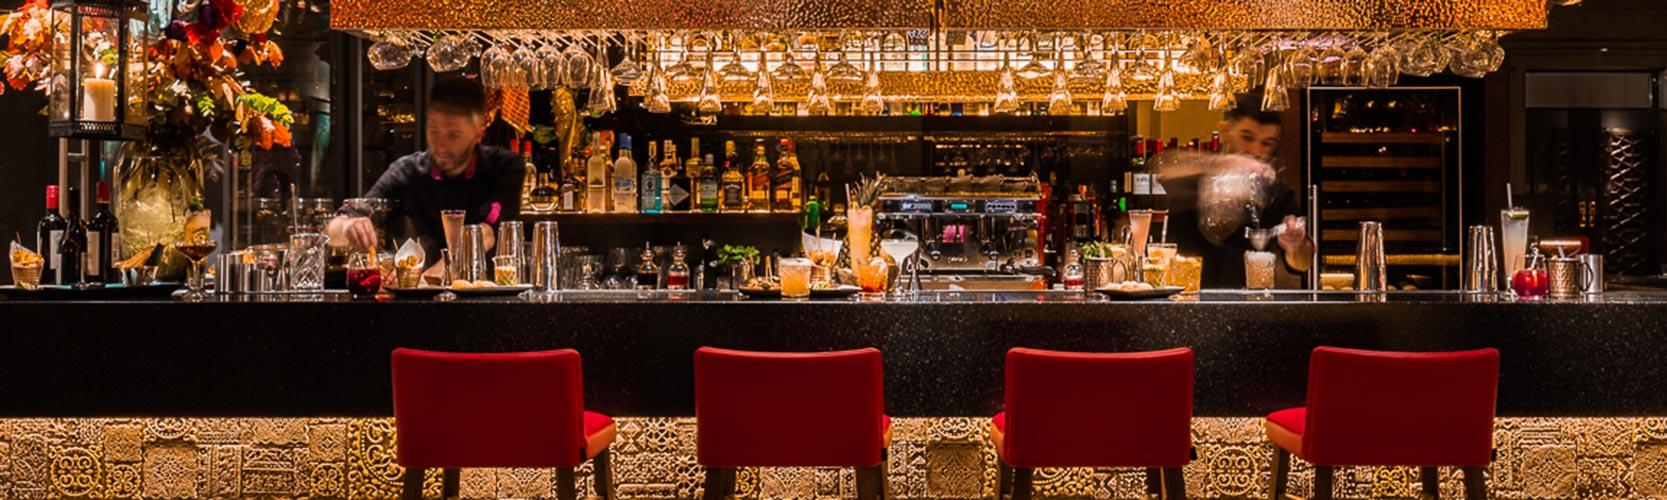 Masala Zone Covent Garden| Best Indian Restaurant Covent Garden ...